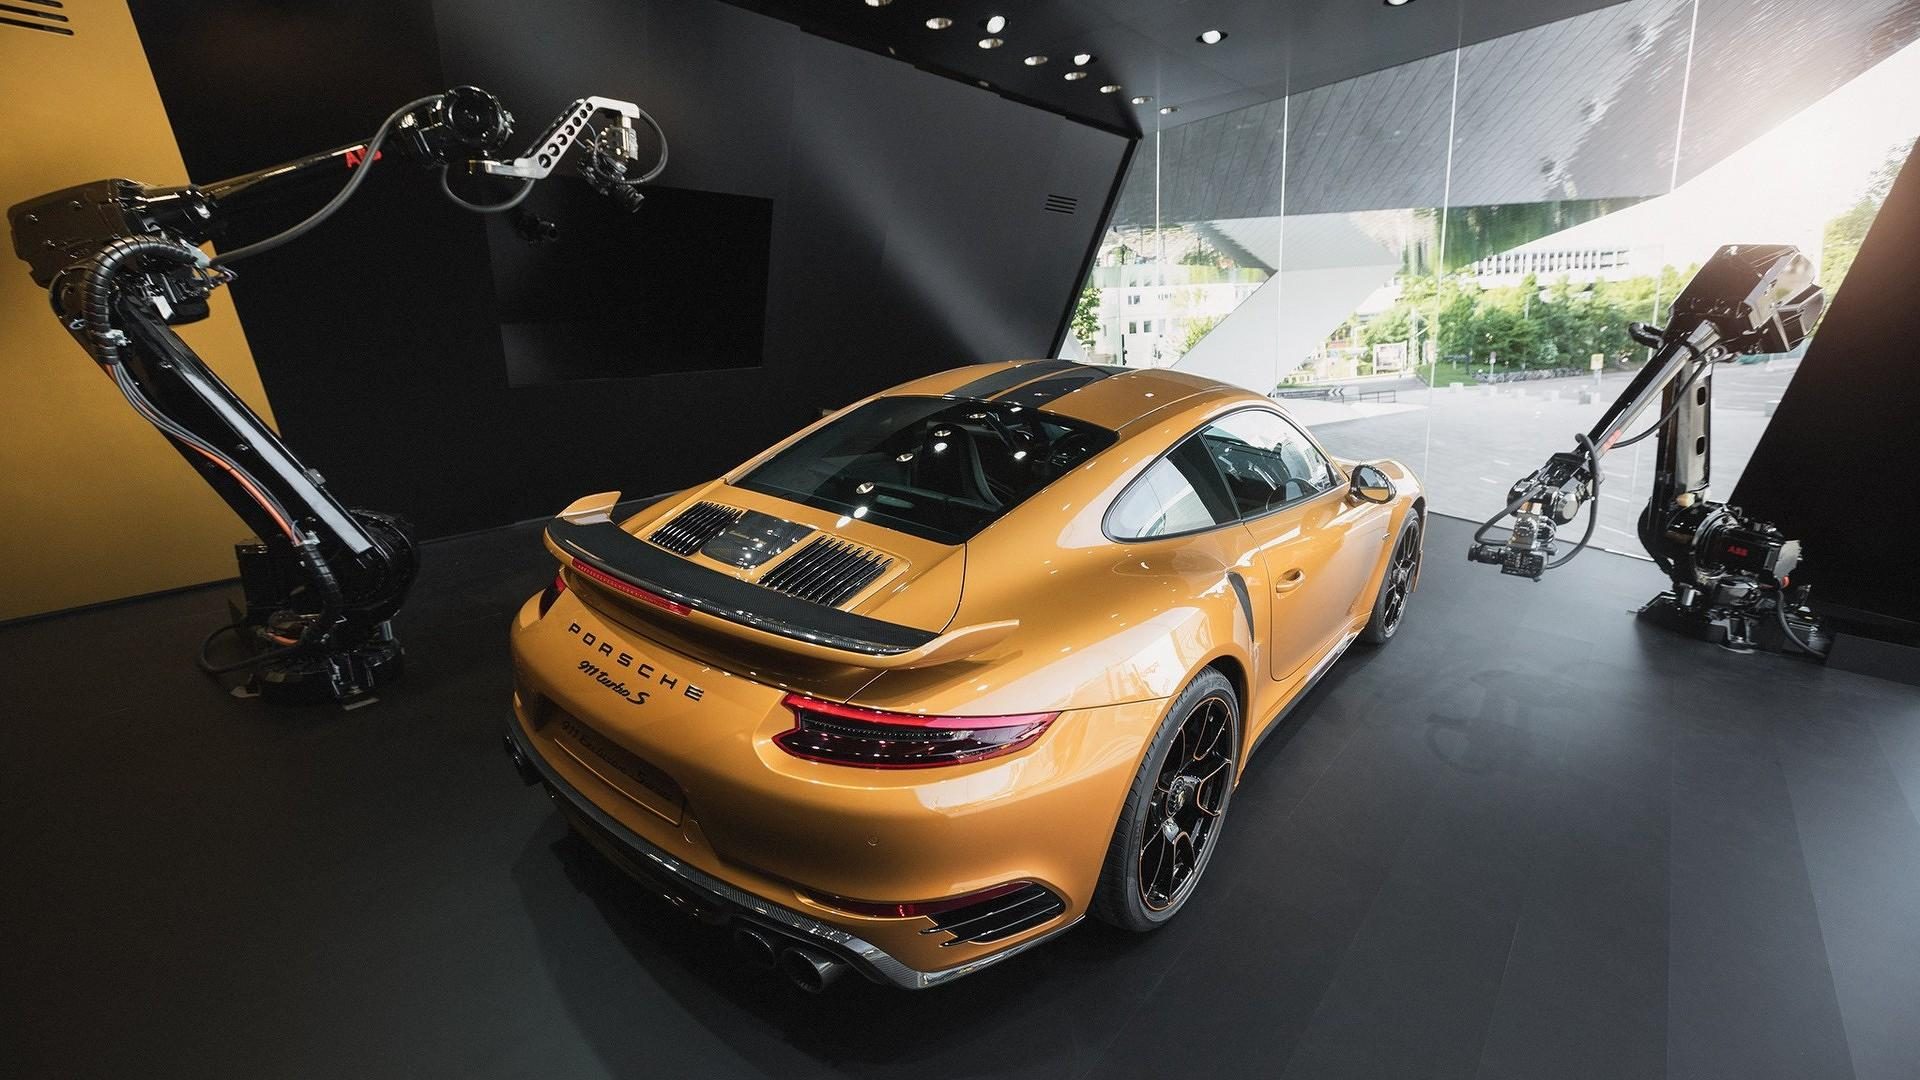 Porsche_911_Turbo_S_Exclusive_Series_08